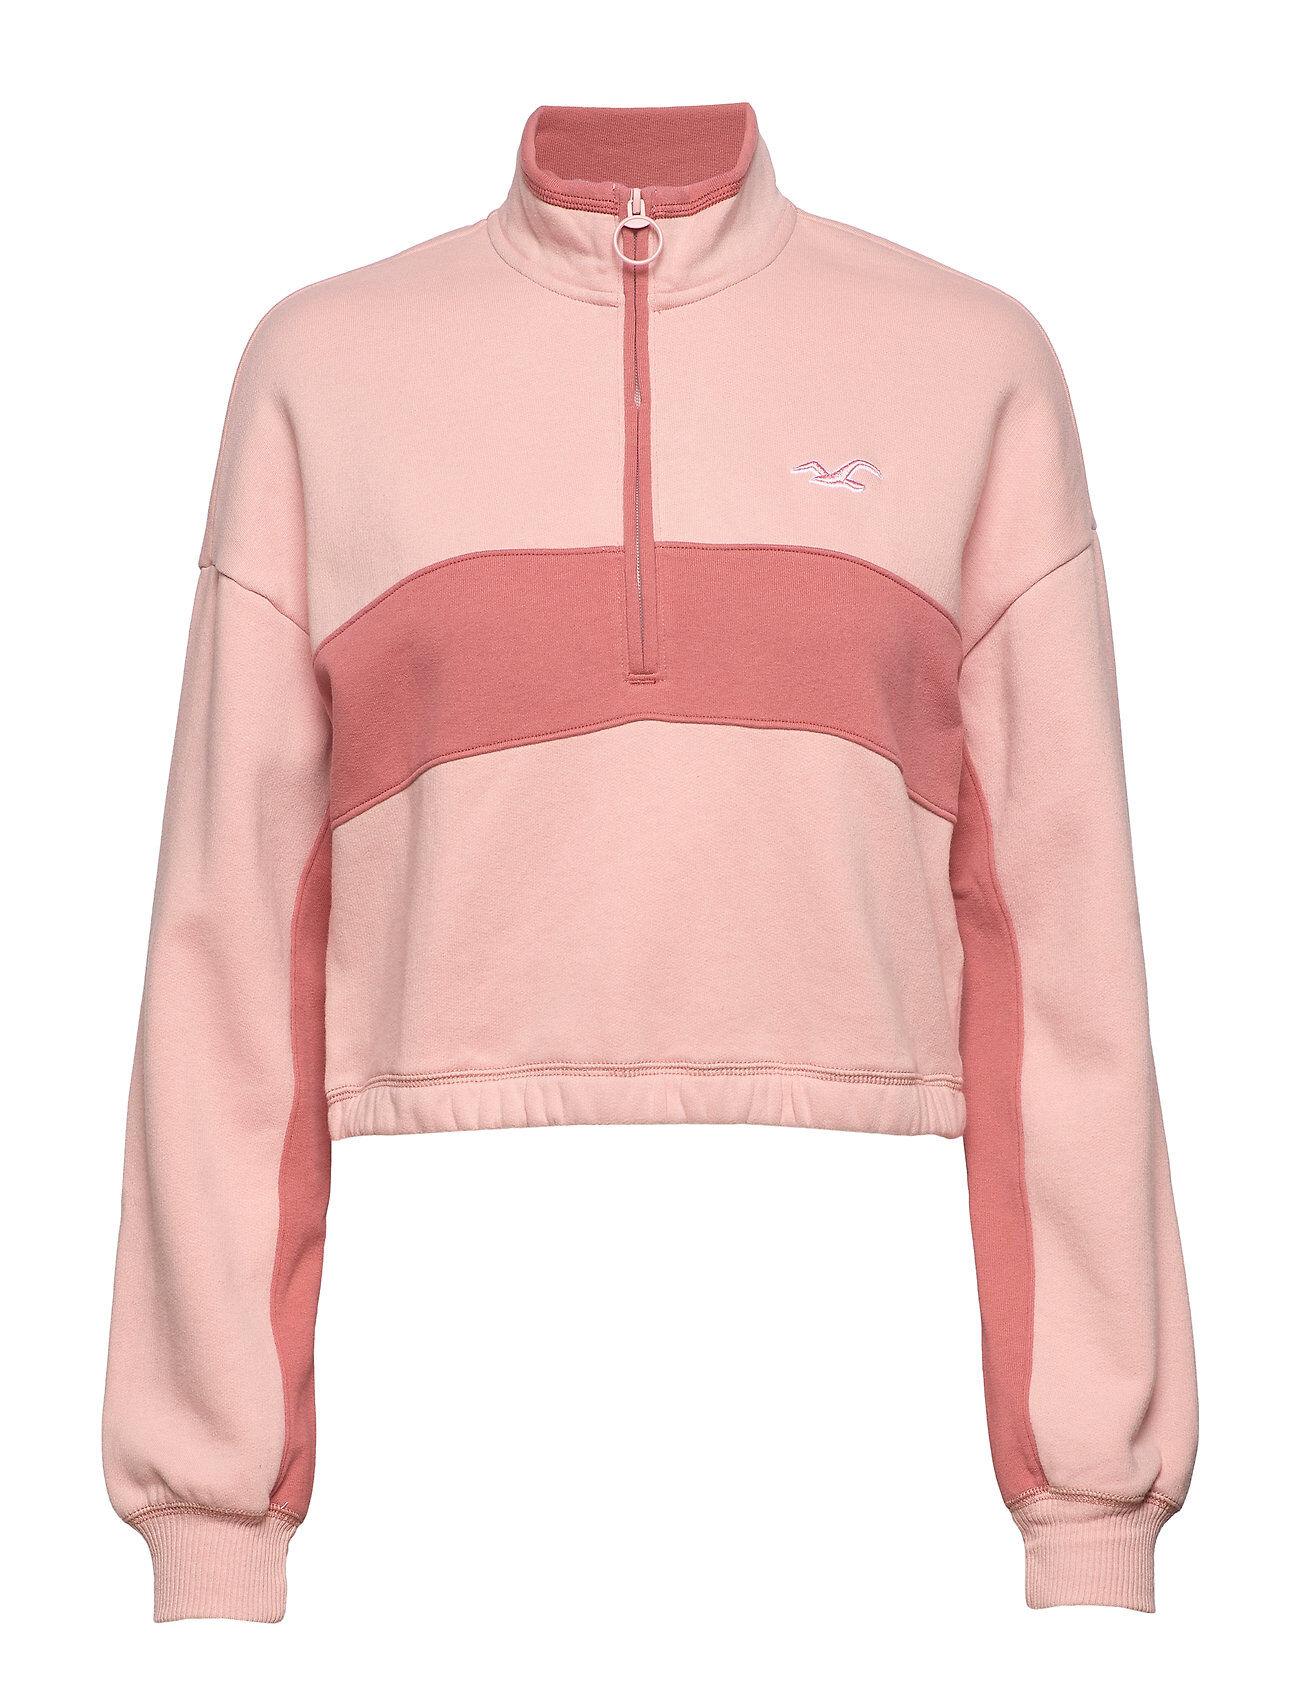 Hollister Ultra Crop Fleece Half Zip Svetari Collegepaita Vaaleanpunainen Hollister